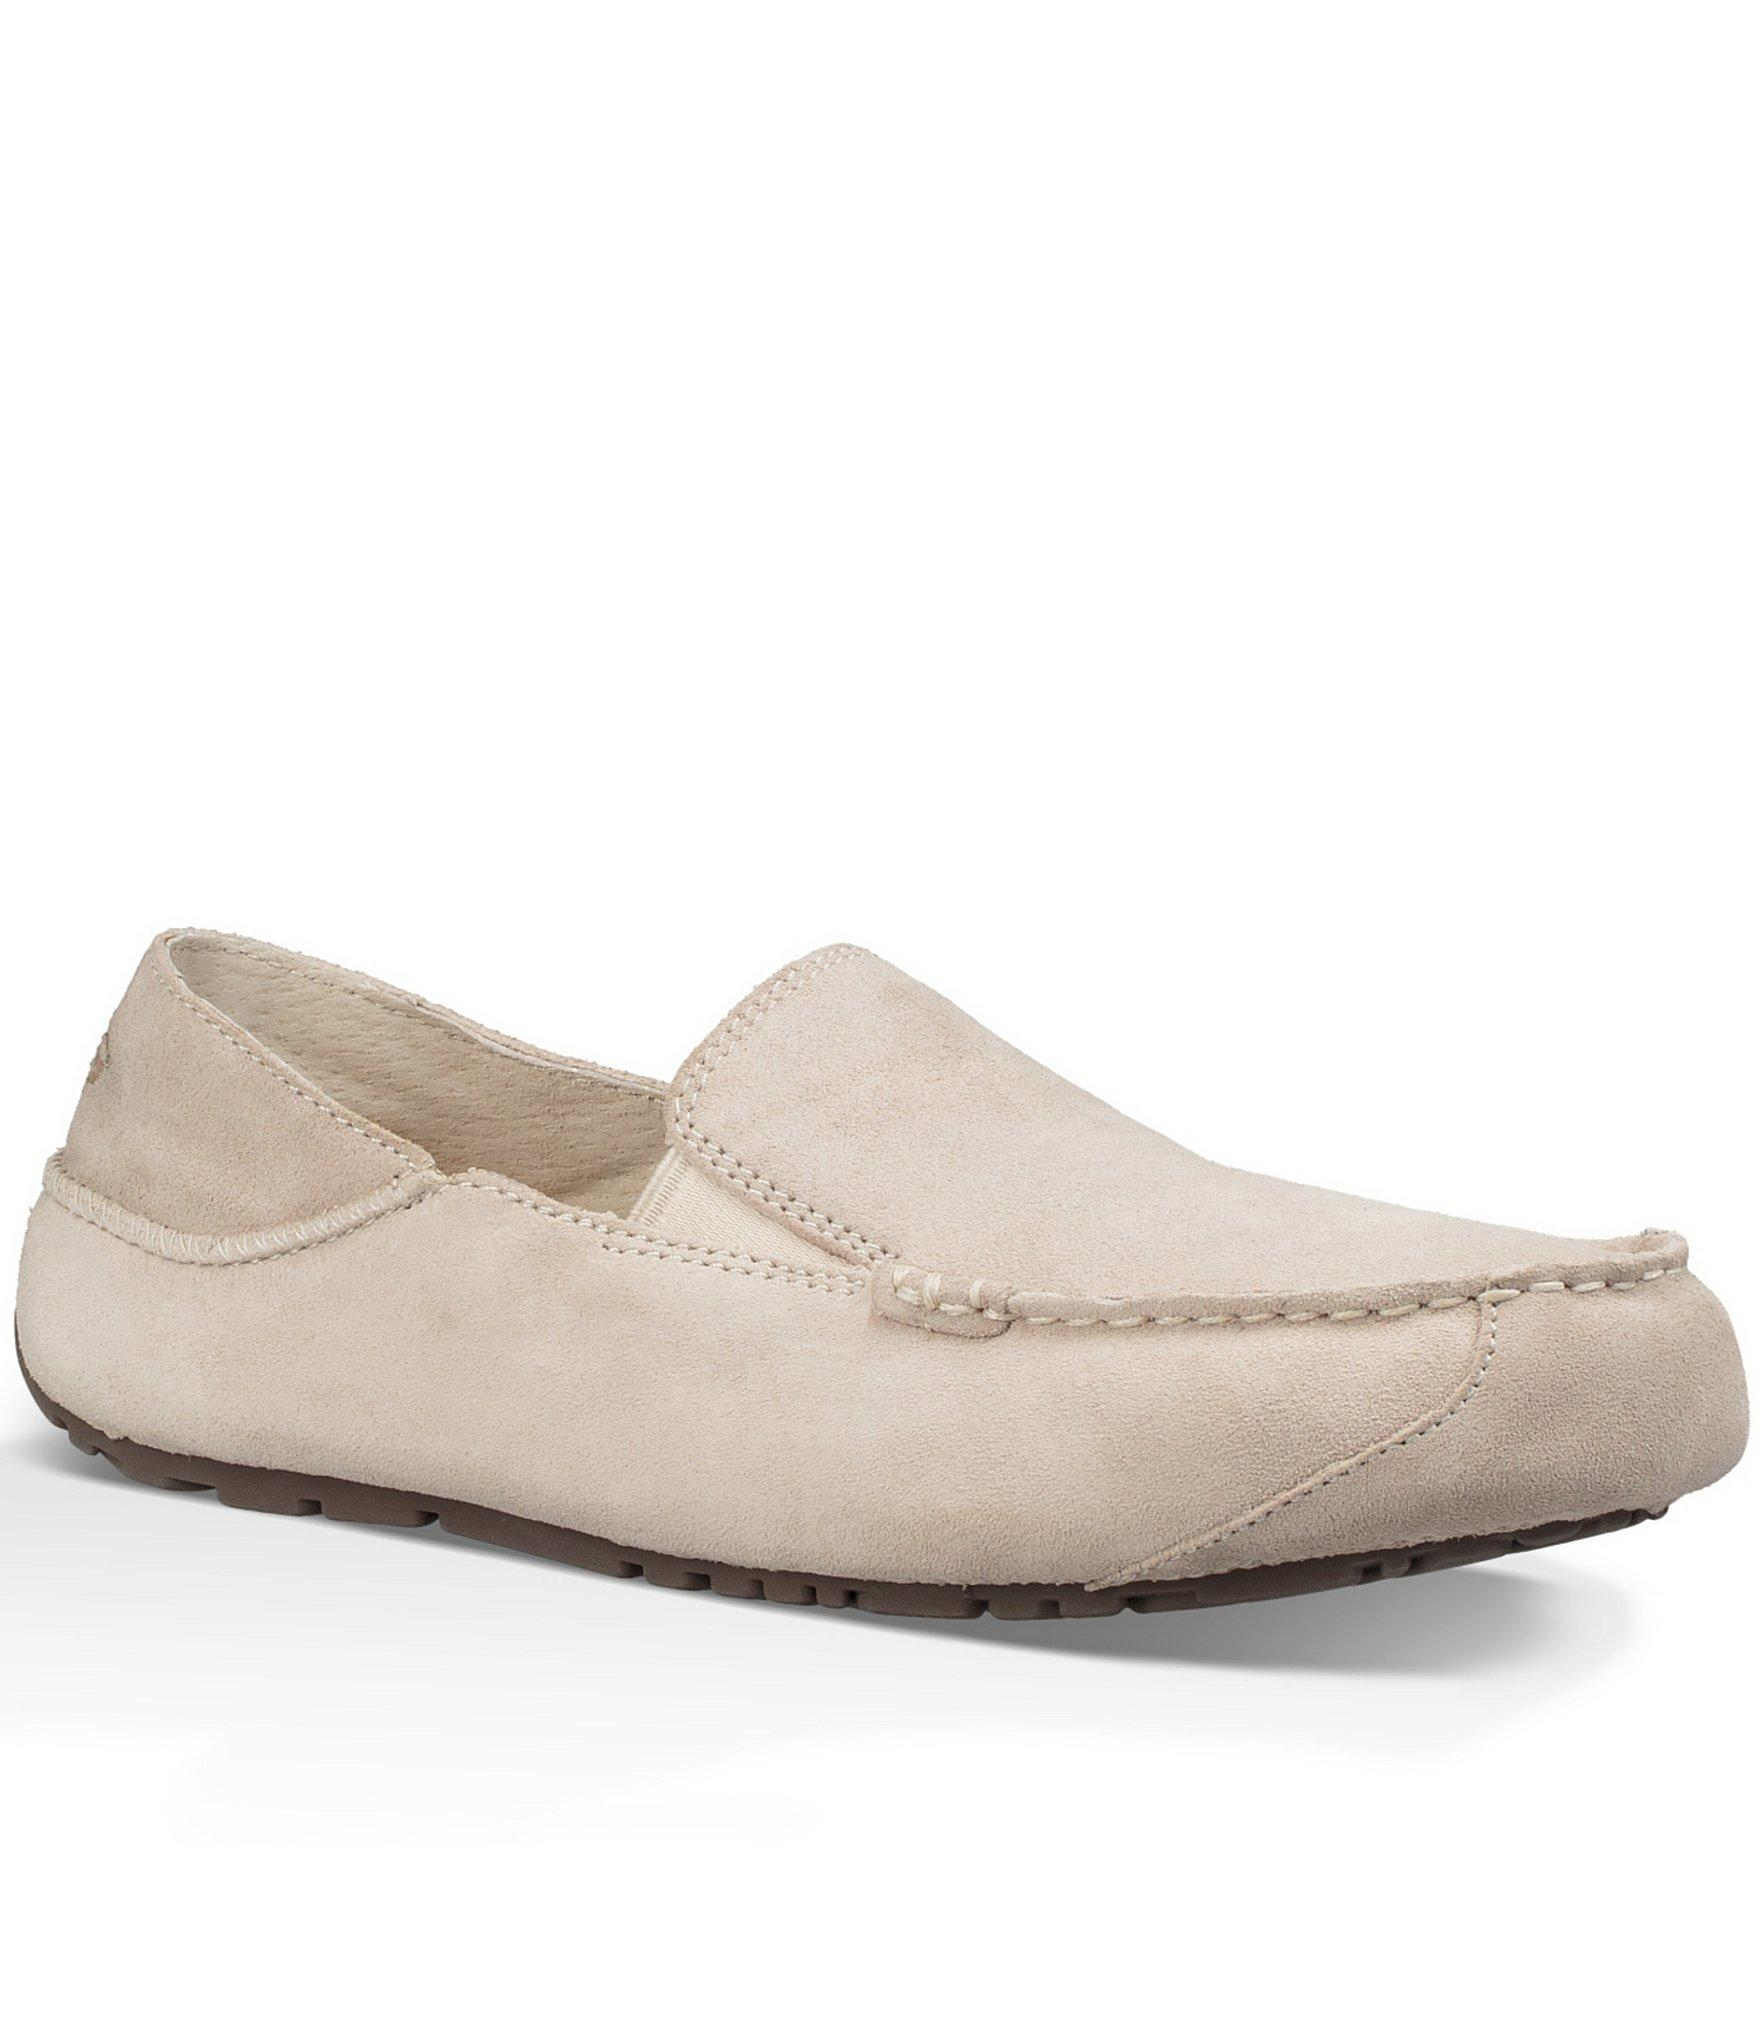 Lyst - UGG ® Men's Upshaw Loafers for Men